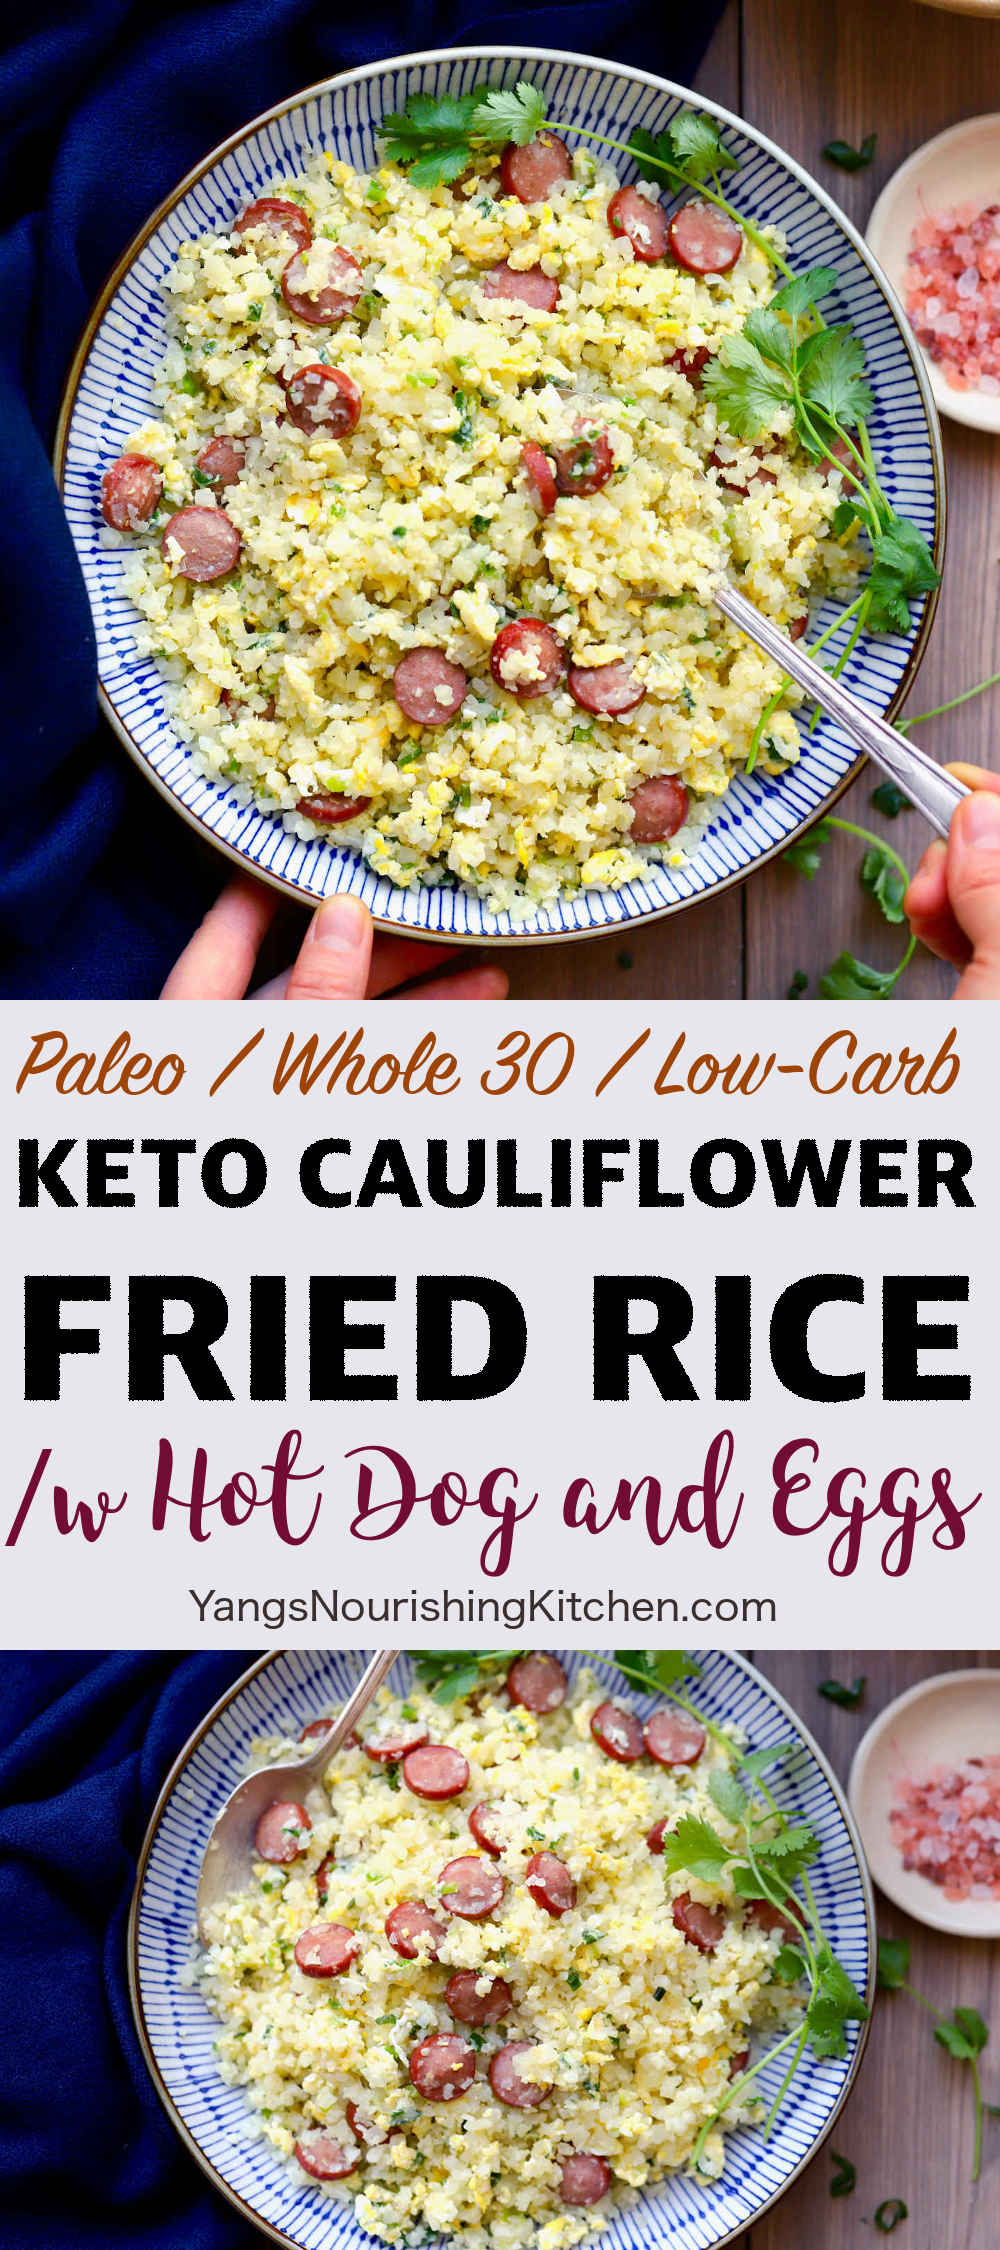 Keto Cauliflower Fried Rice /w Hot Dog and Eggs